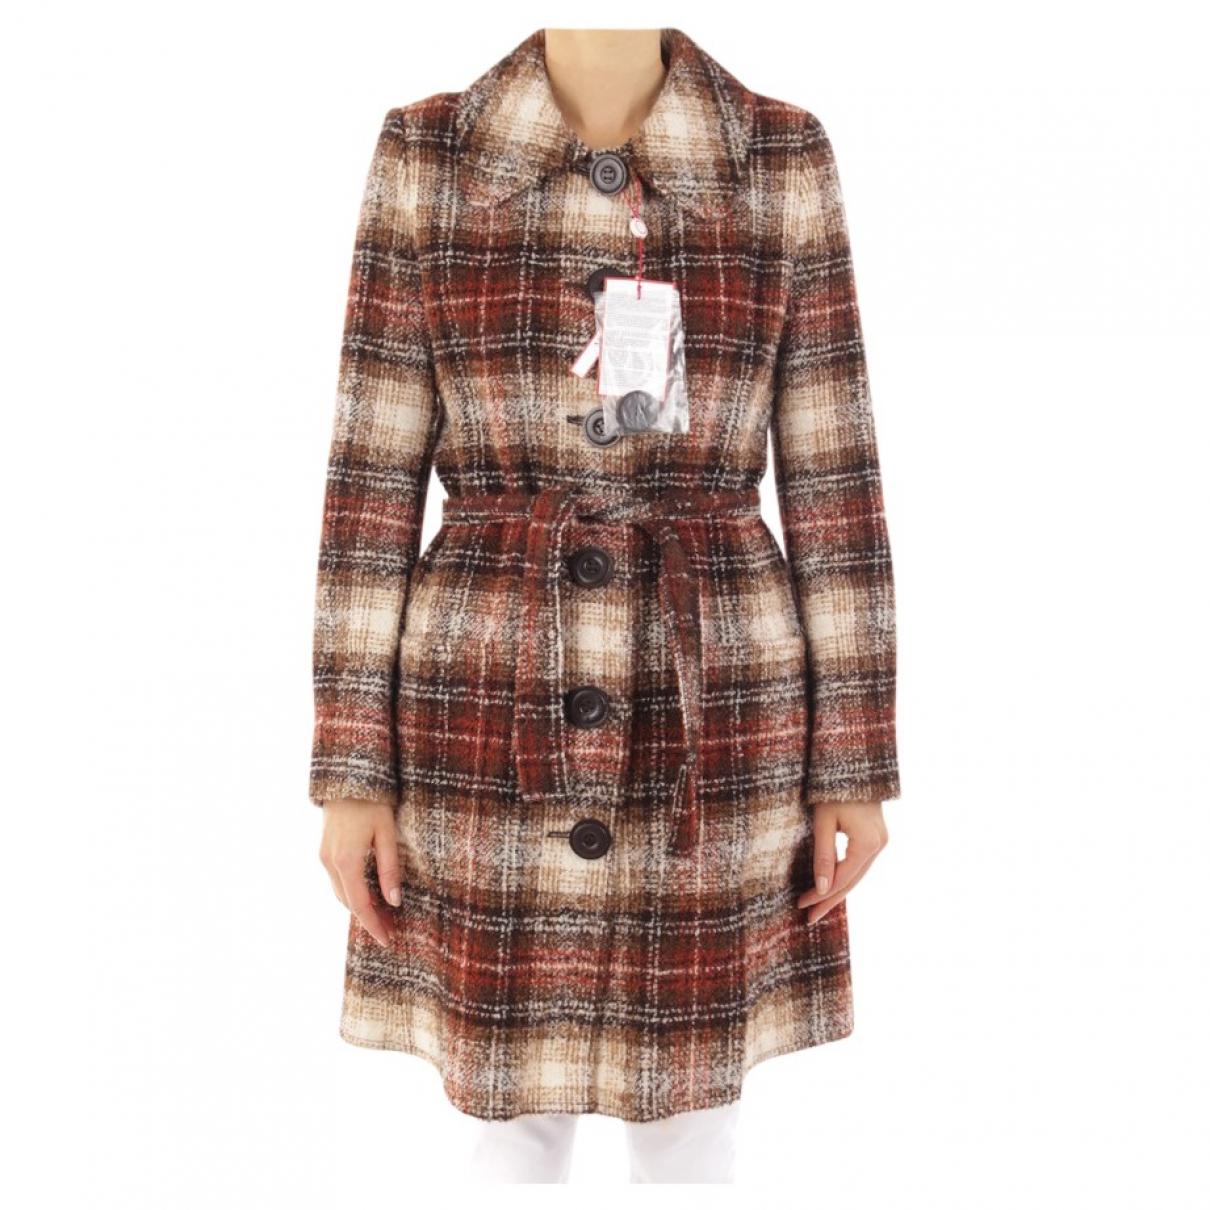 Max & Co \N Multicolour jacket for Women 40 FR